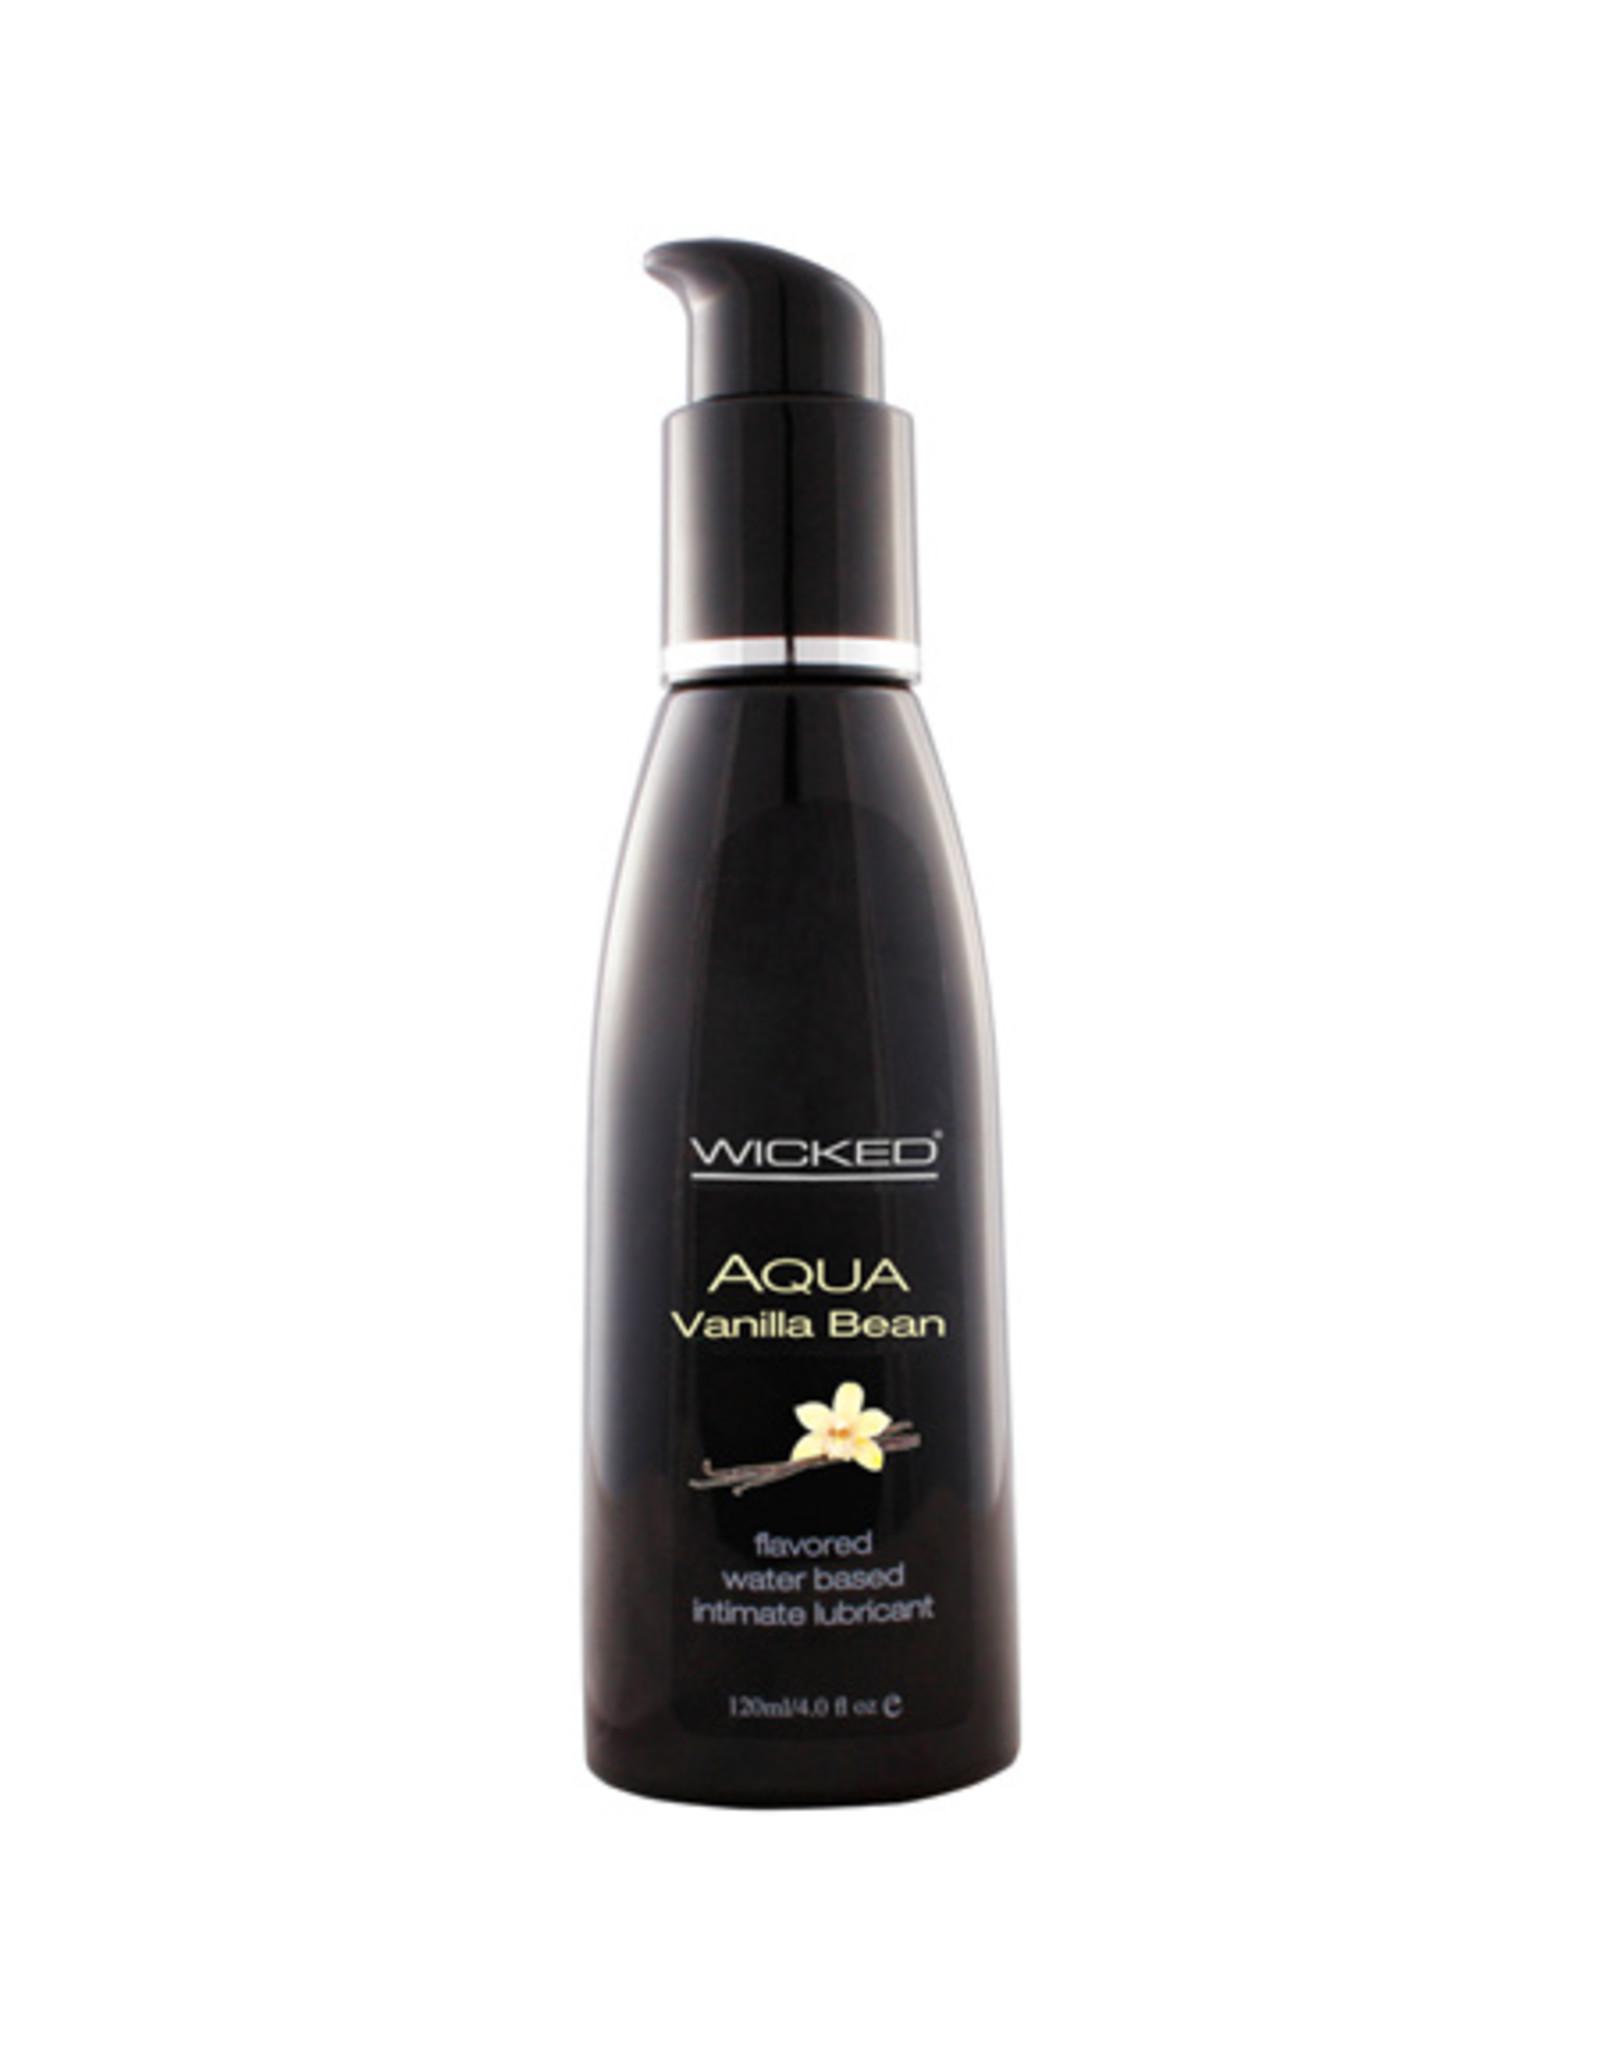 Wicked Sensual Care Aqua Water Based Lubricant - 4 oz Vanilla Bean